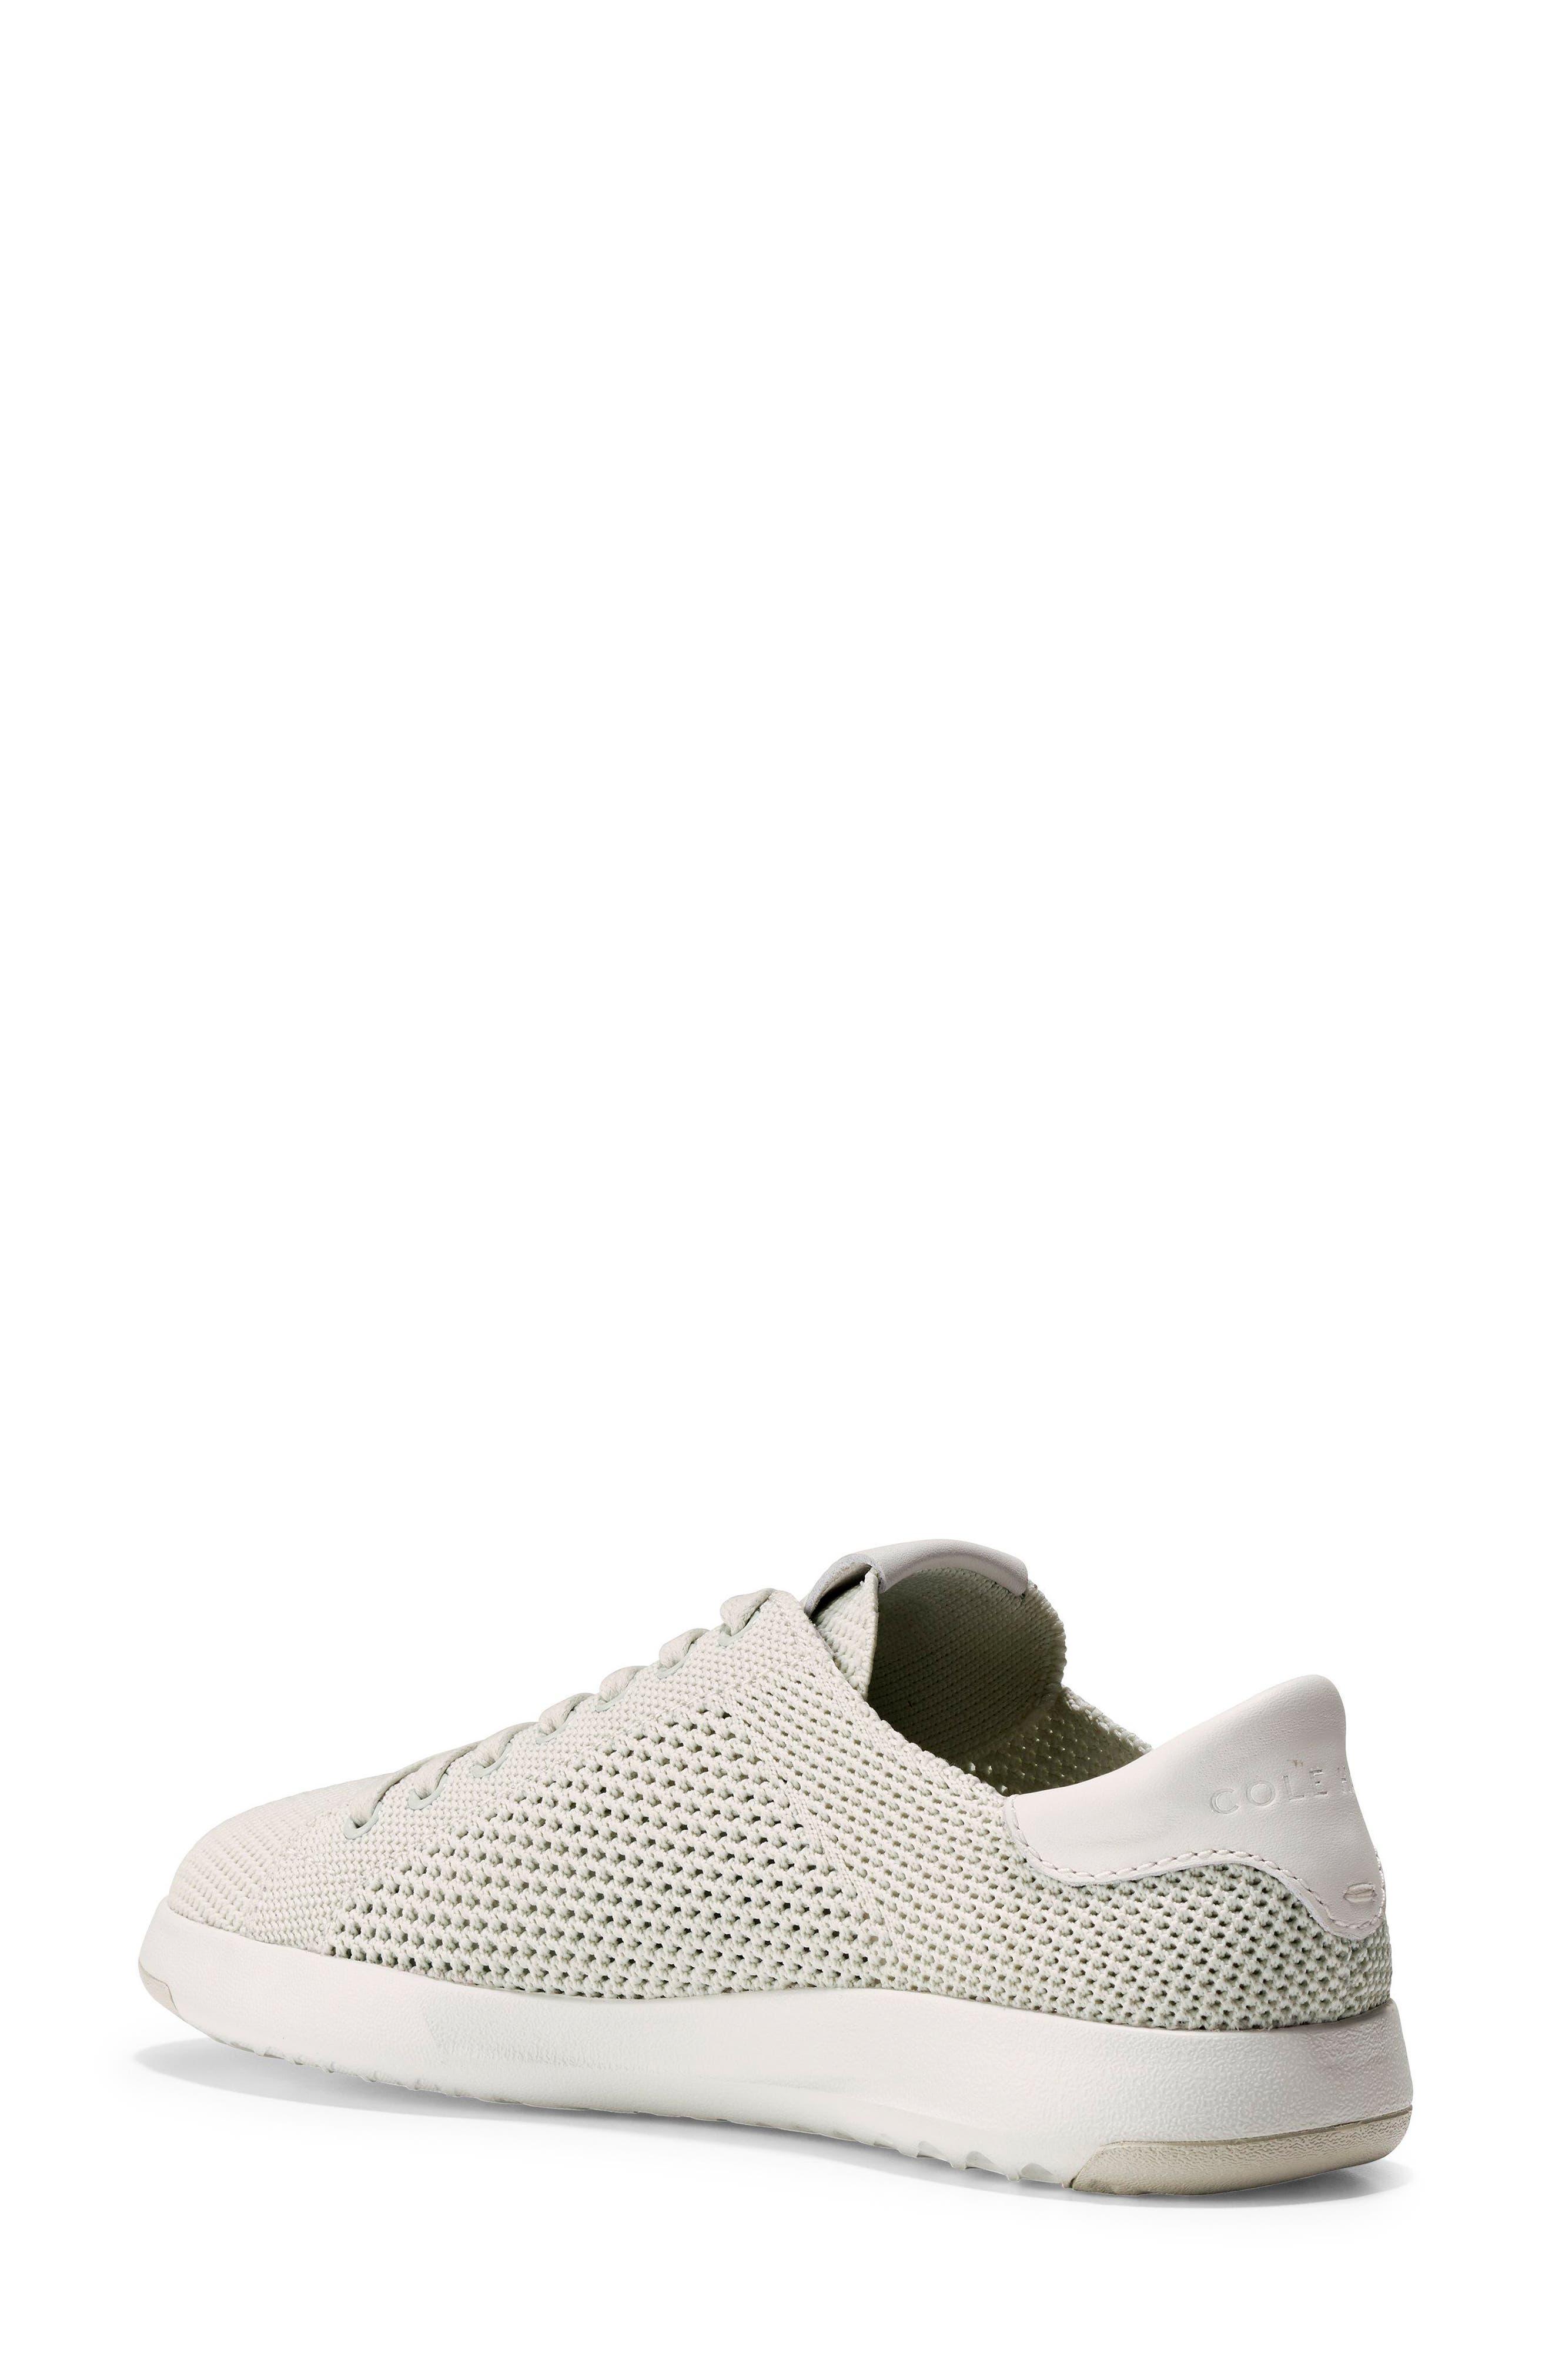 GrandPro Stitchlite Sneaker,                             Alternate thumbnail 2, color,                             CHALK FABRIC